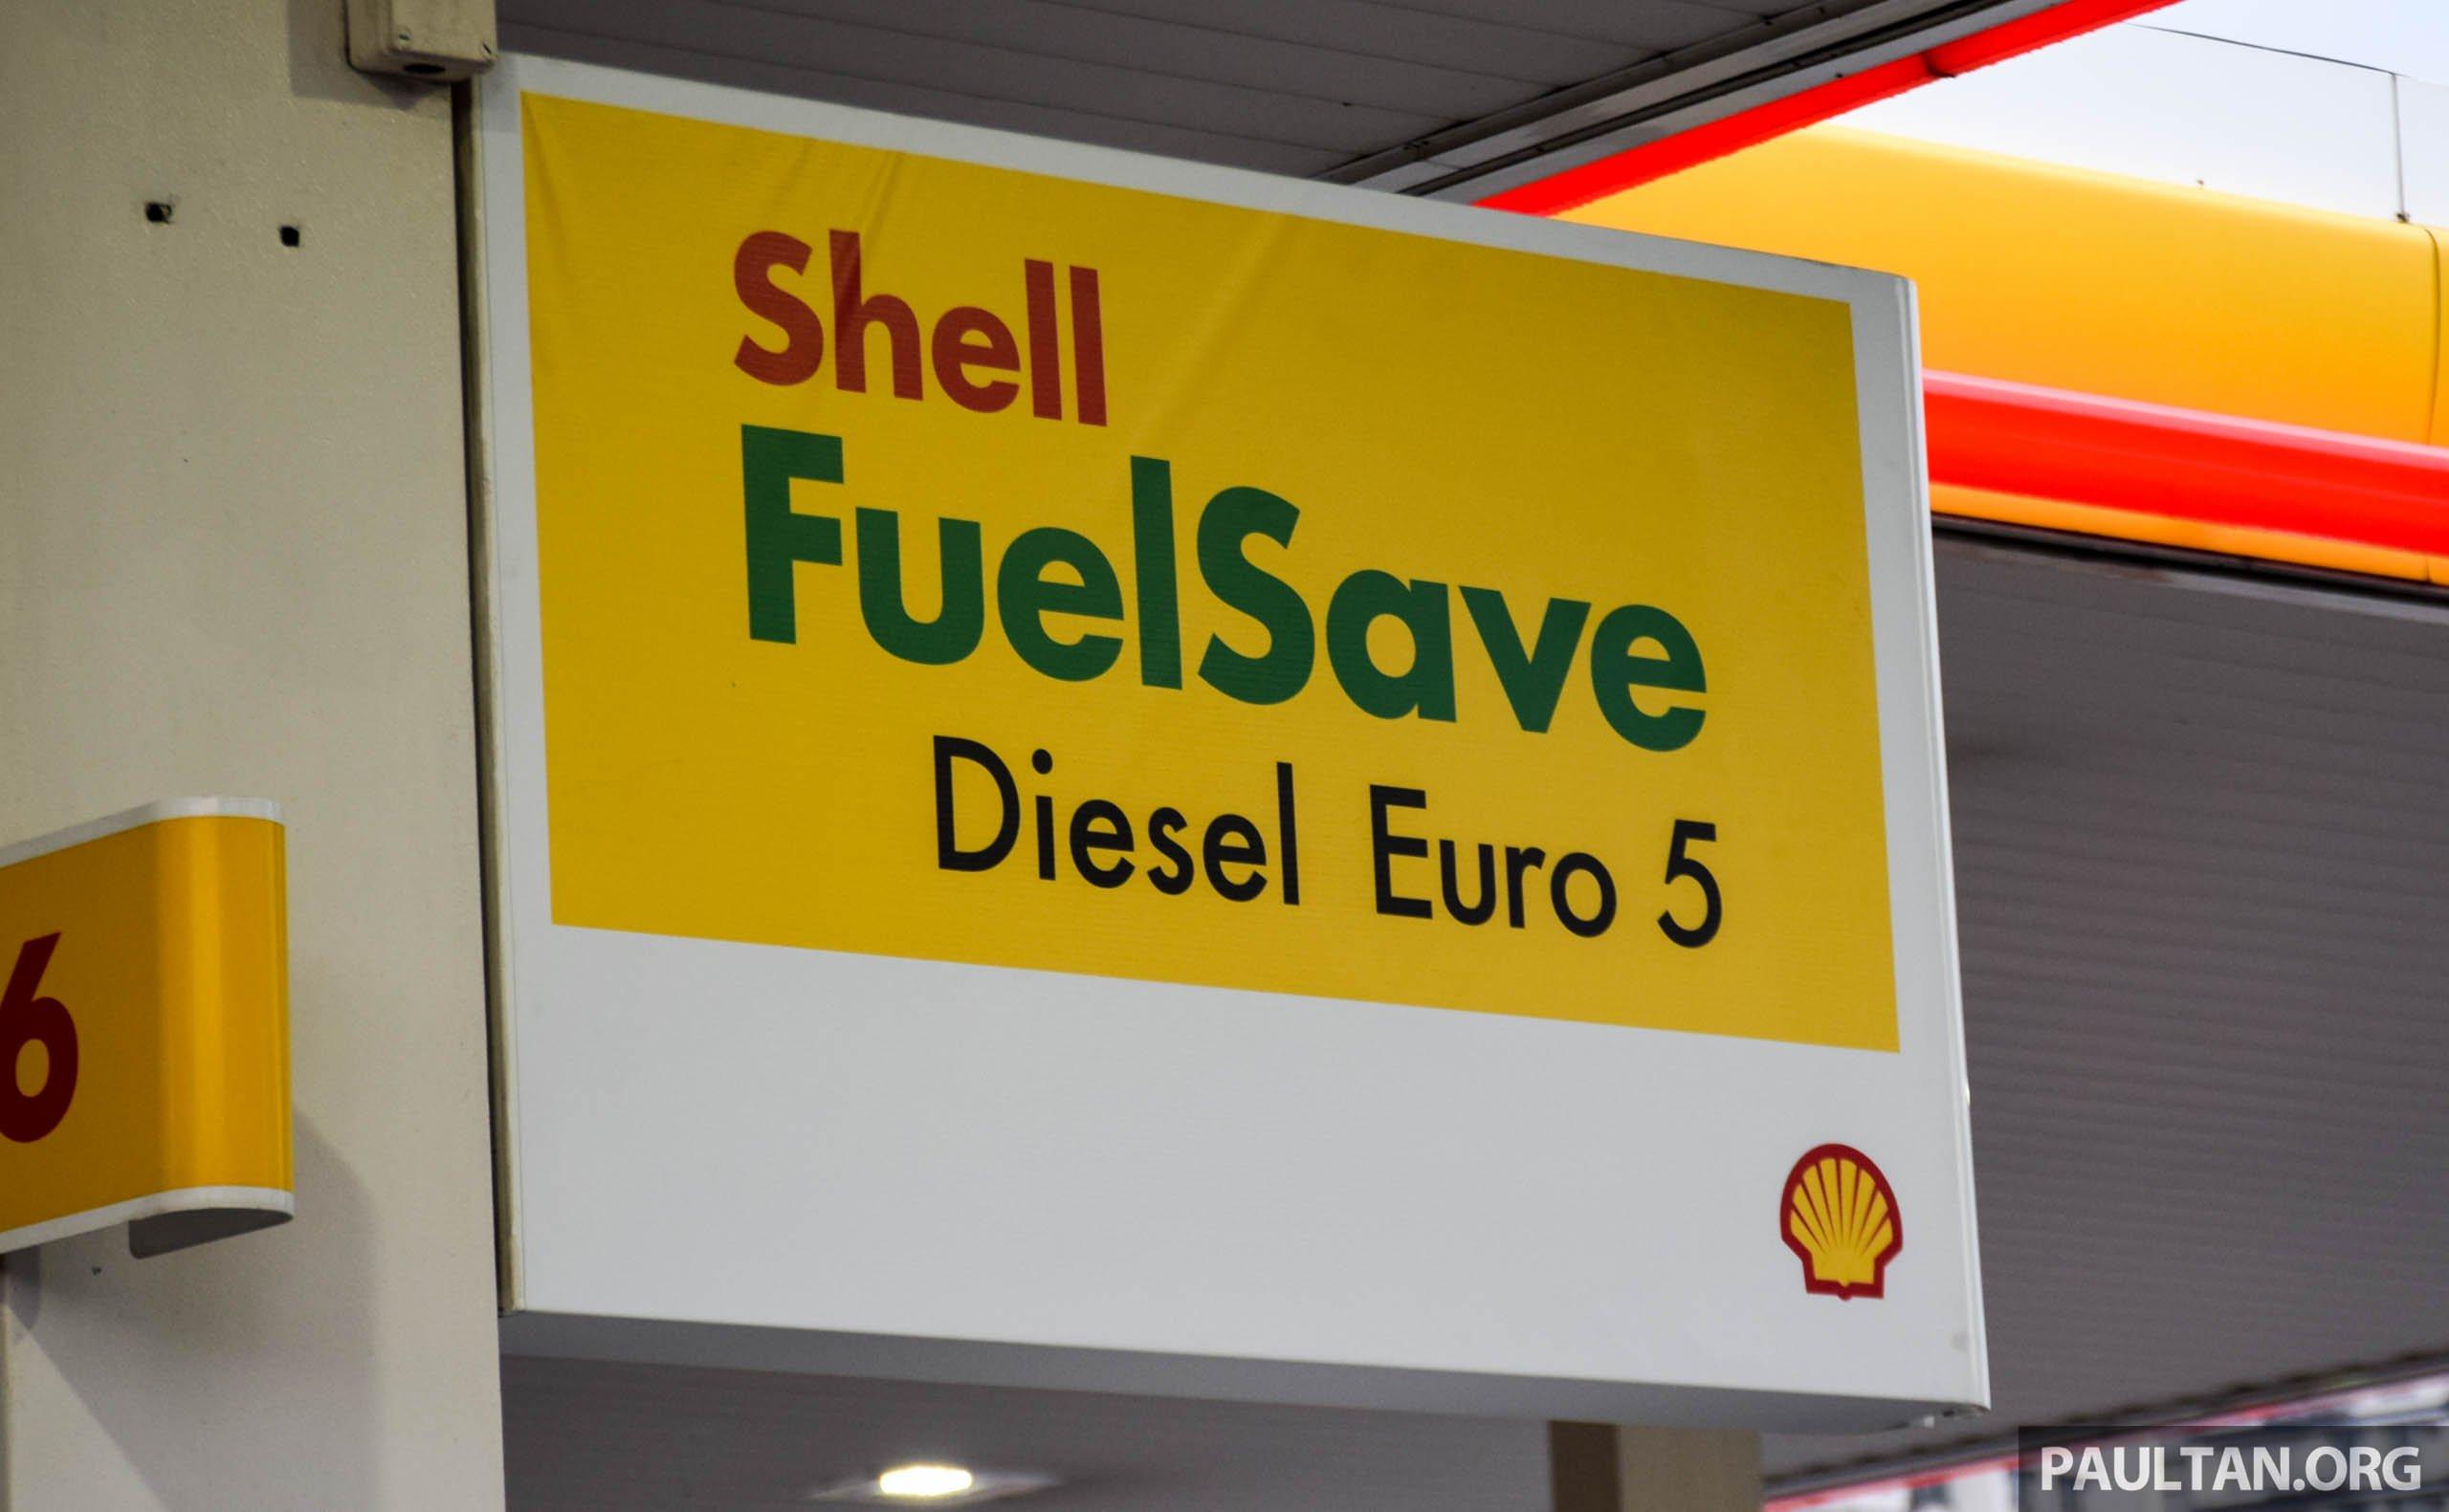 shell lancar diesel euro 5 untuk pasaran sarawak. Black Bedroom Furniture Sets. Home Design Ideas